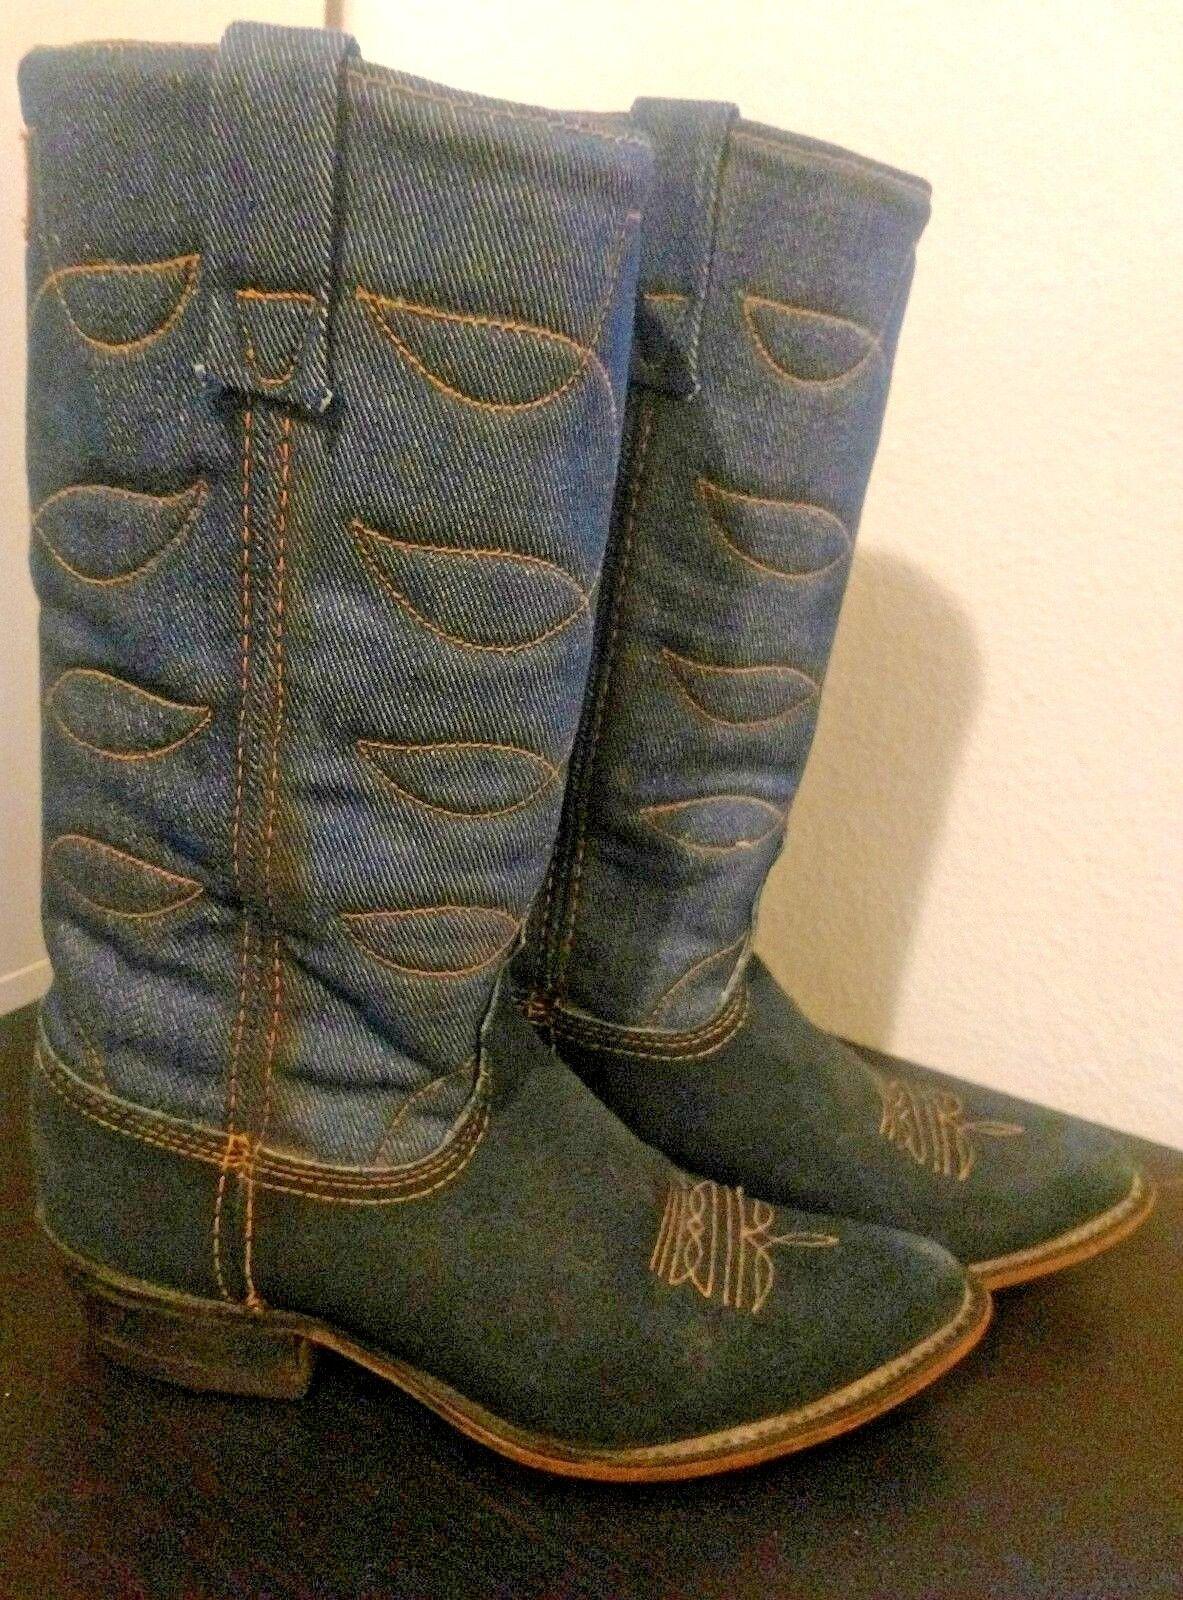 ACME women's boots vintage blueE SUEDE DENIM LEATHER COWBOY WESTERN size 6 M